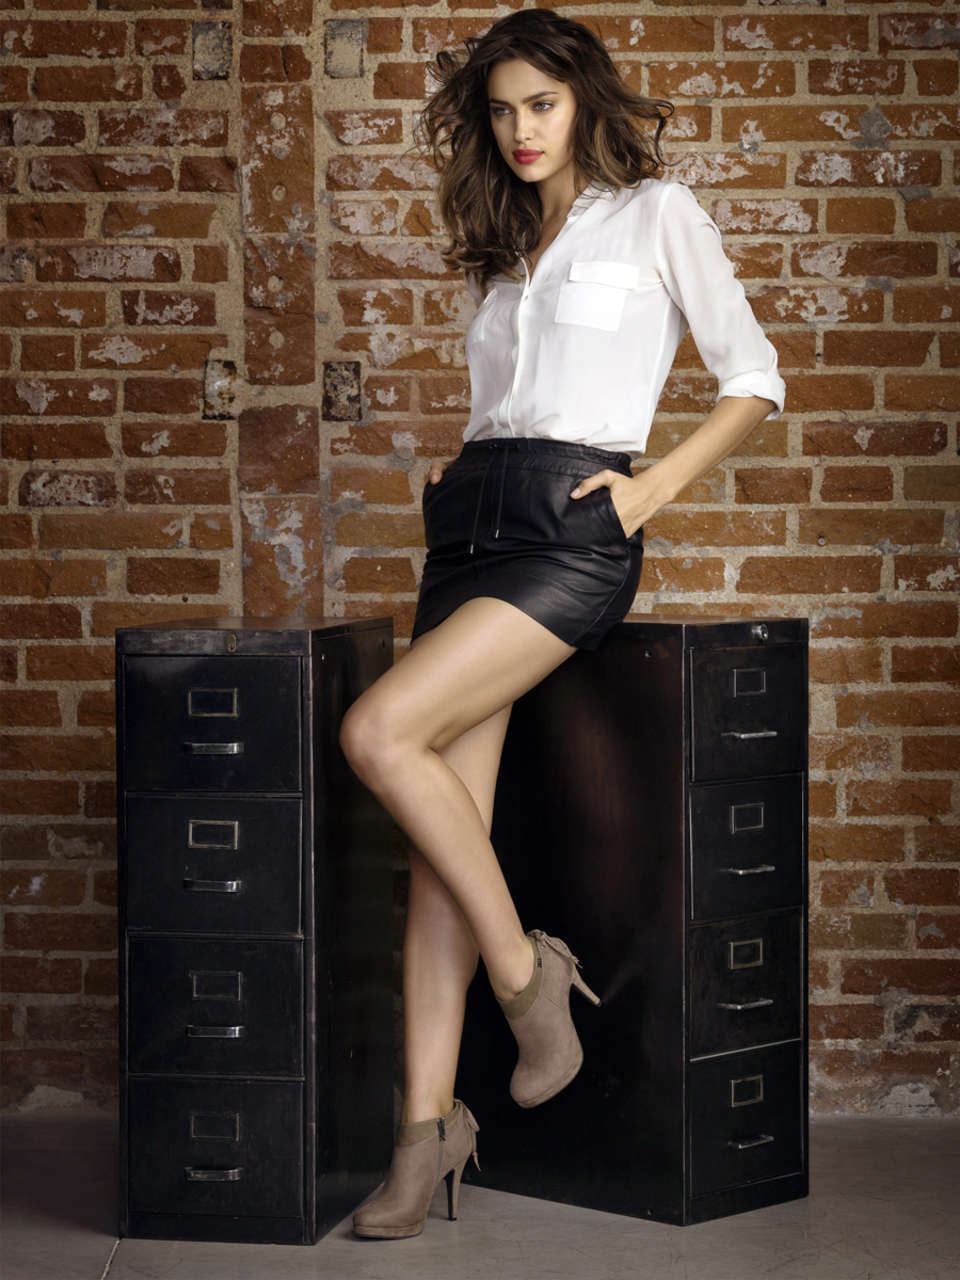 Irina Shayk Xti Footwear Irina Shayk Photos 2013 Xti